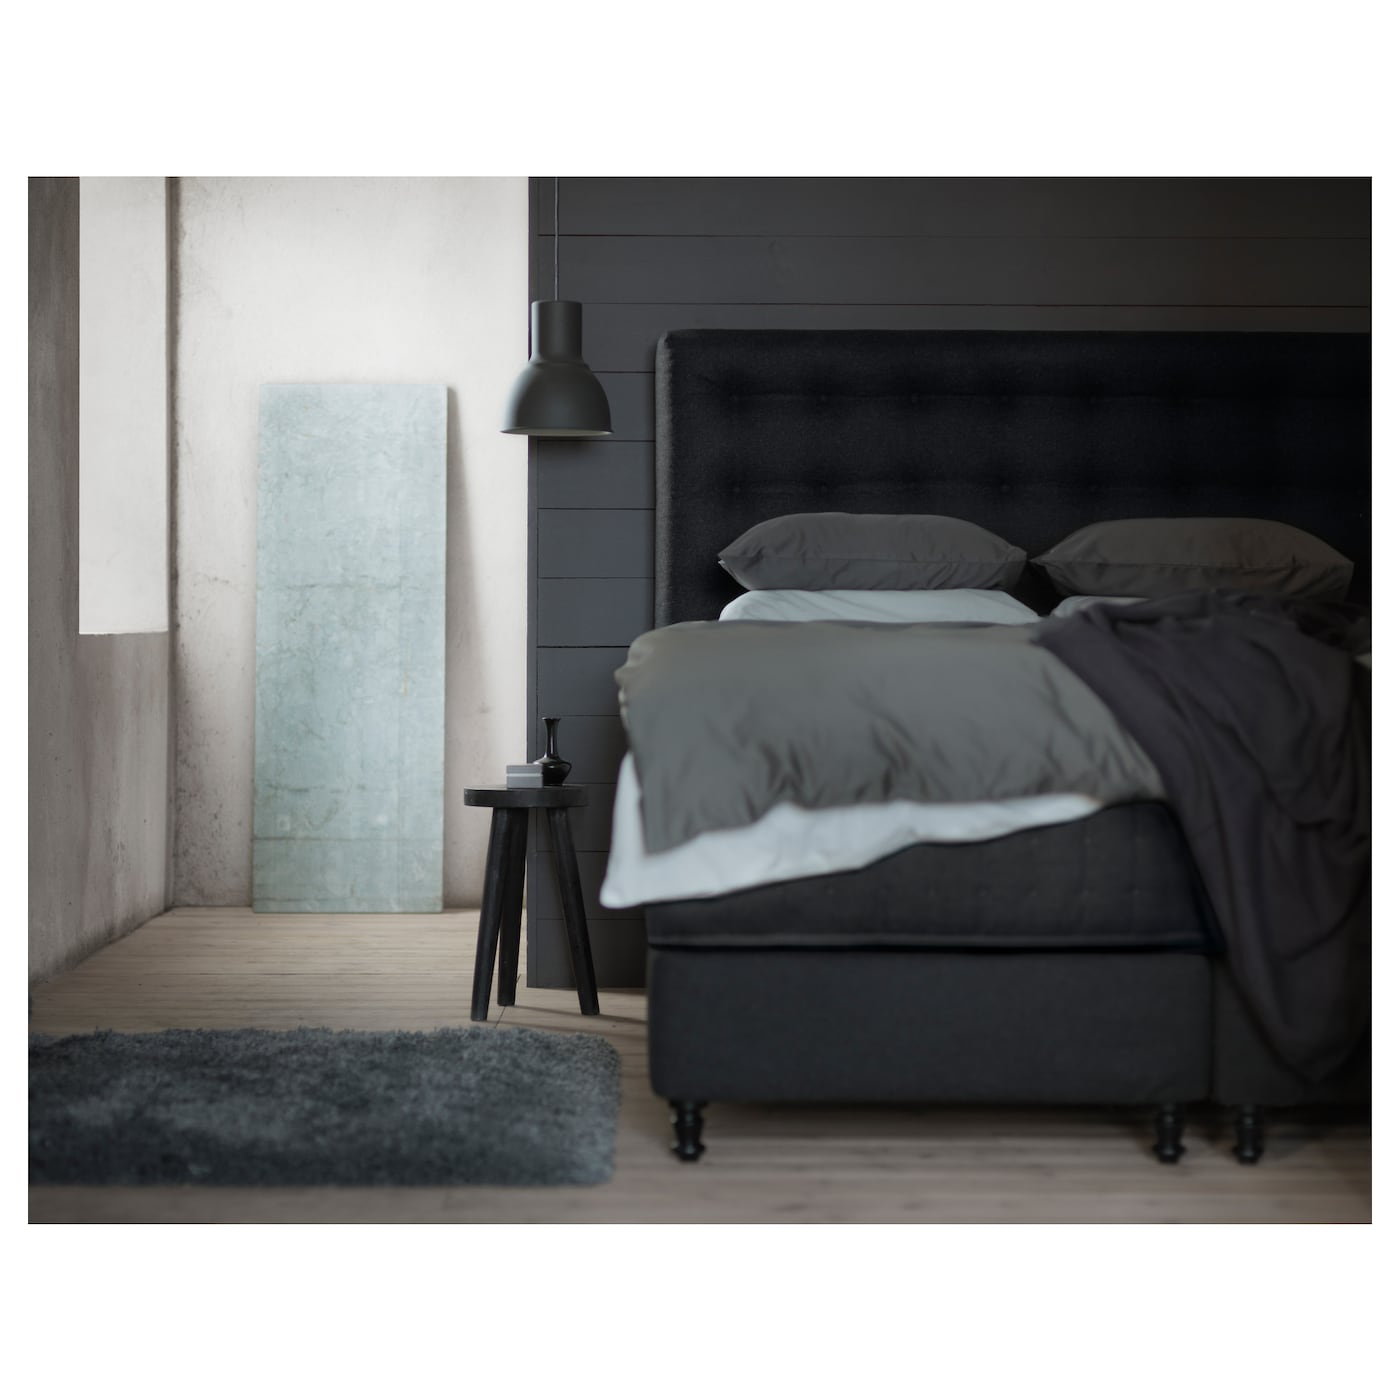 vallavik lit sommier hyllestad ferme tuss y gris 180x200 cm ikea. Black Bedroom Furniture Sets. Home Design Ideas